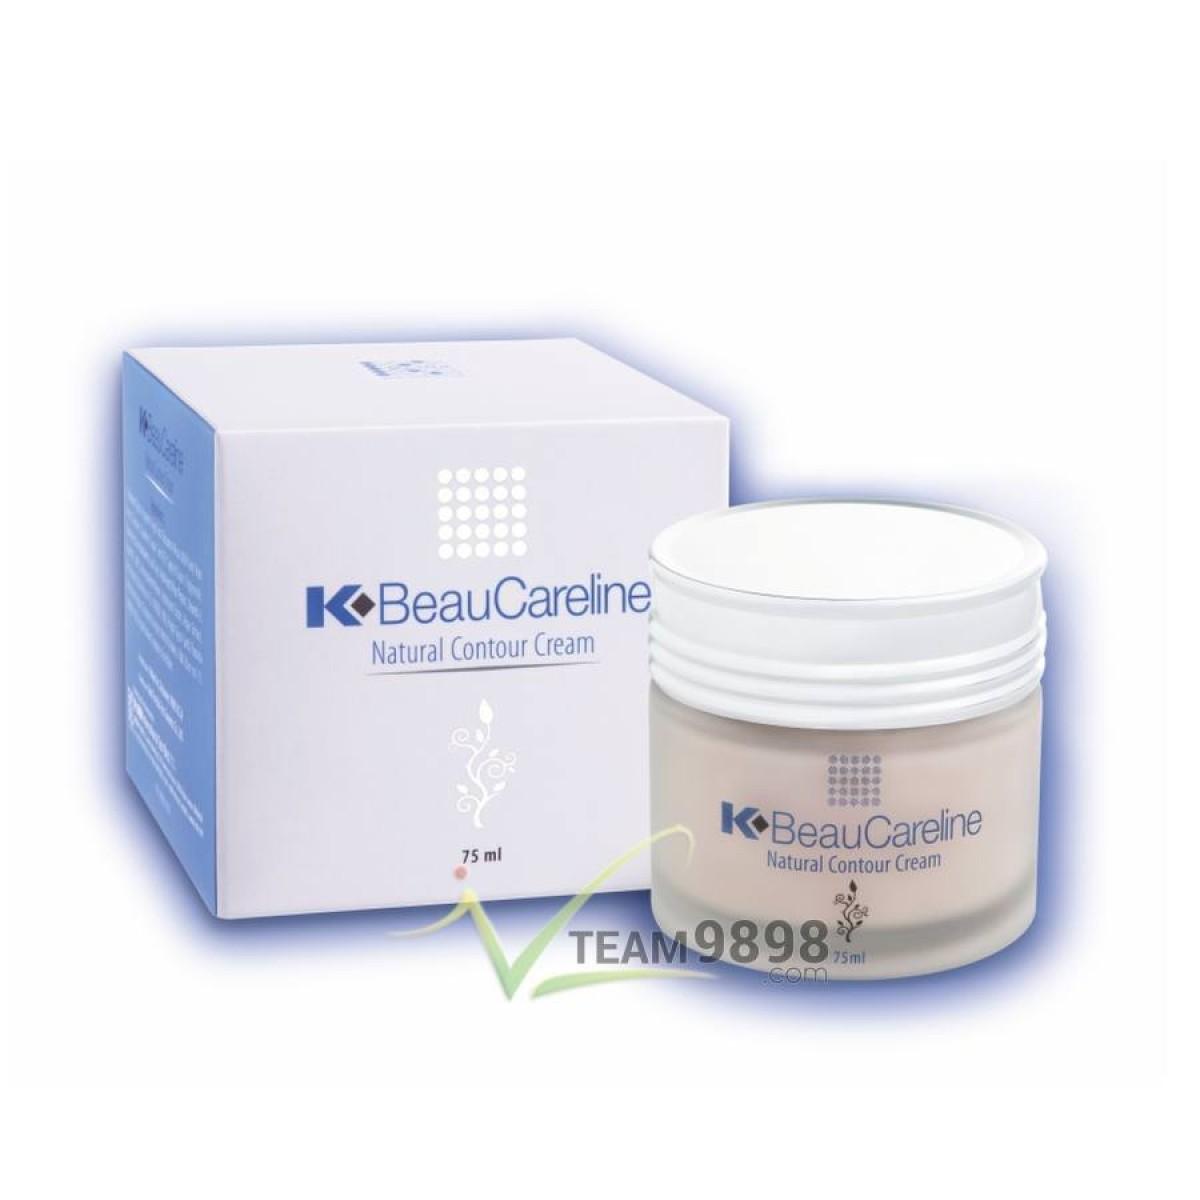 K-BeauCareline Natural Contour Cream